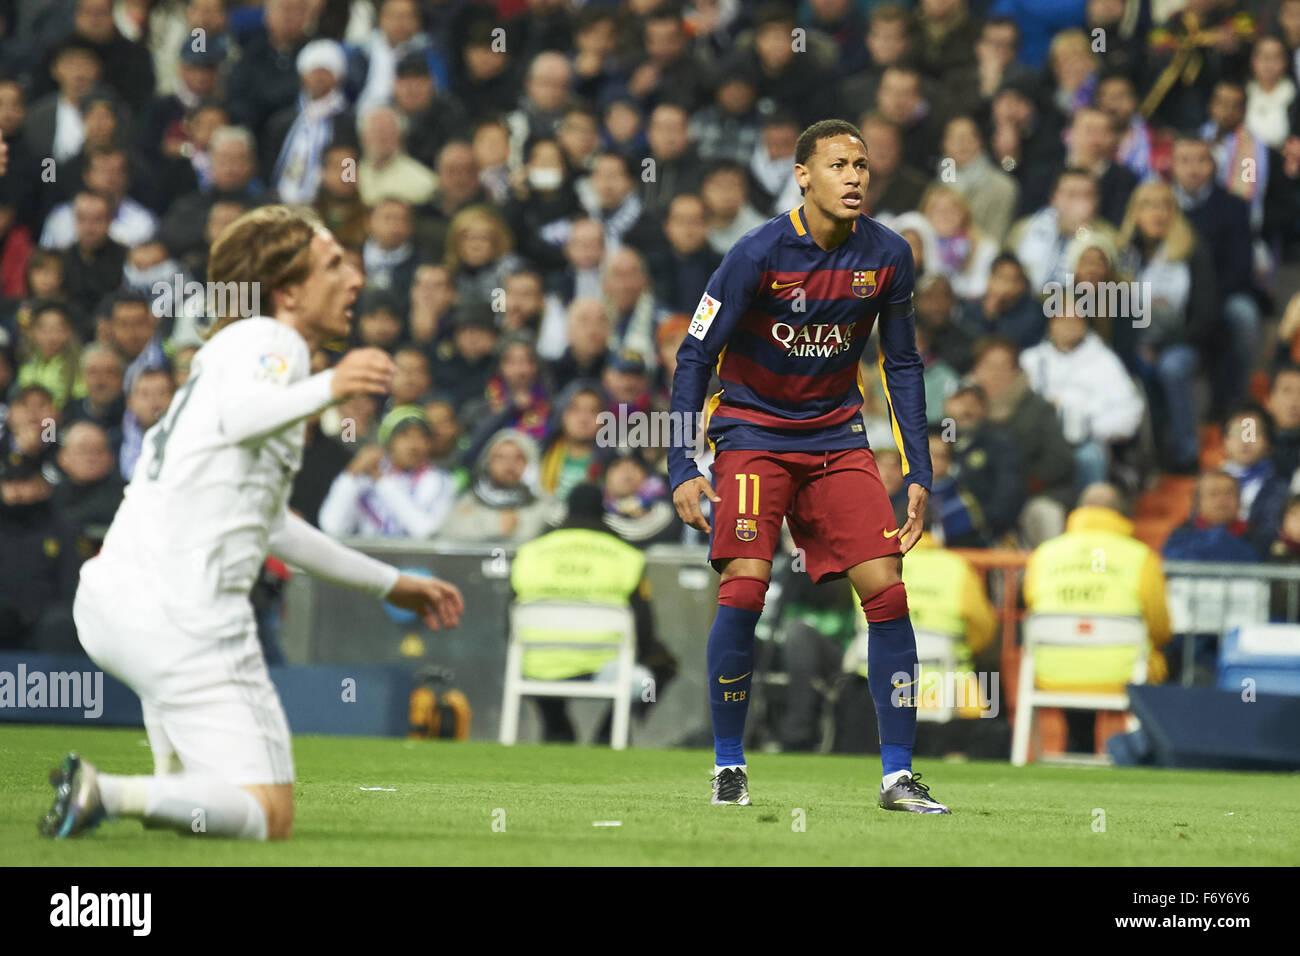 Madrid, Spain. 21st Nov, 2015. Neymar (forward, F.C. Barcelona) in action during La Liga match between Real Madrid Stock Photo